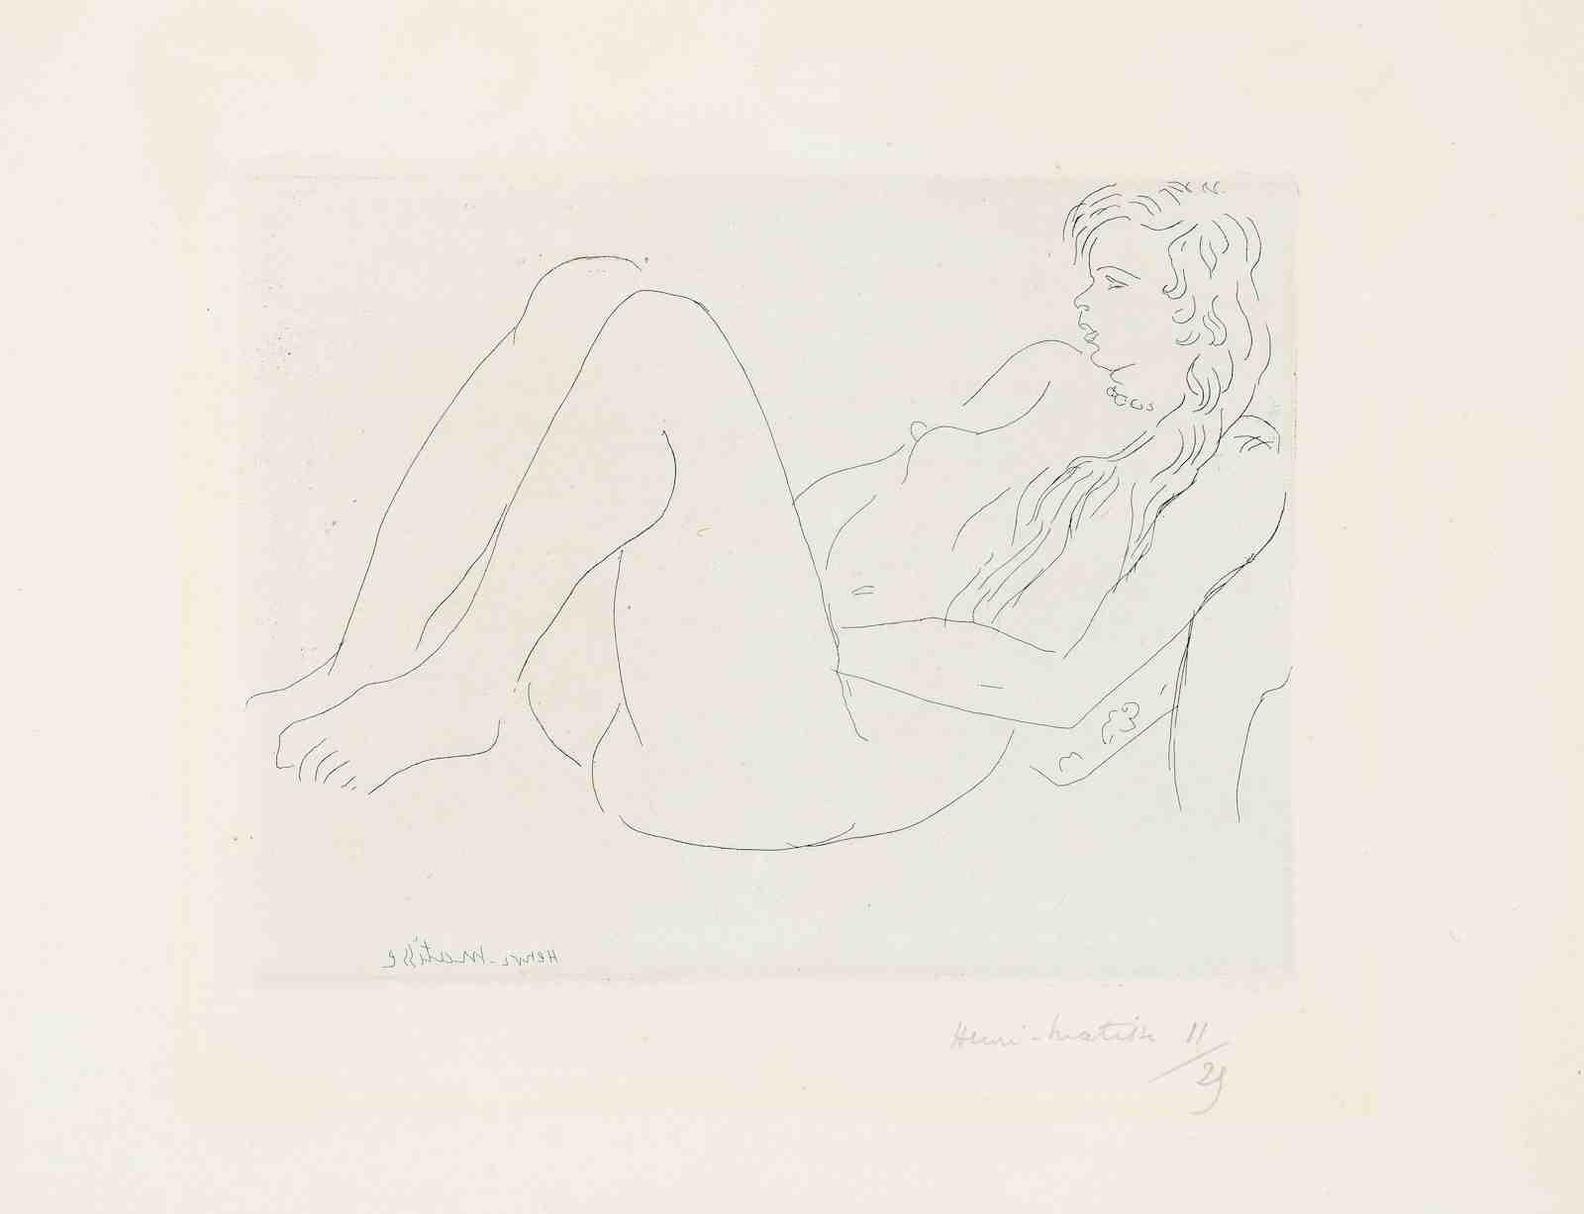 Pierre-Auguste Renoir-La Danse A La Campagne - 2E Planche-1890